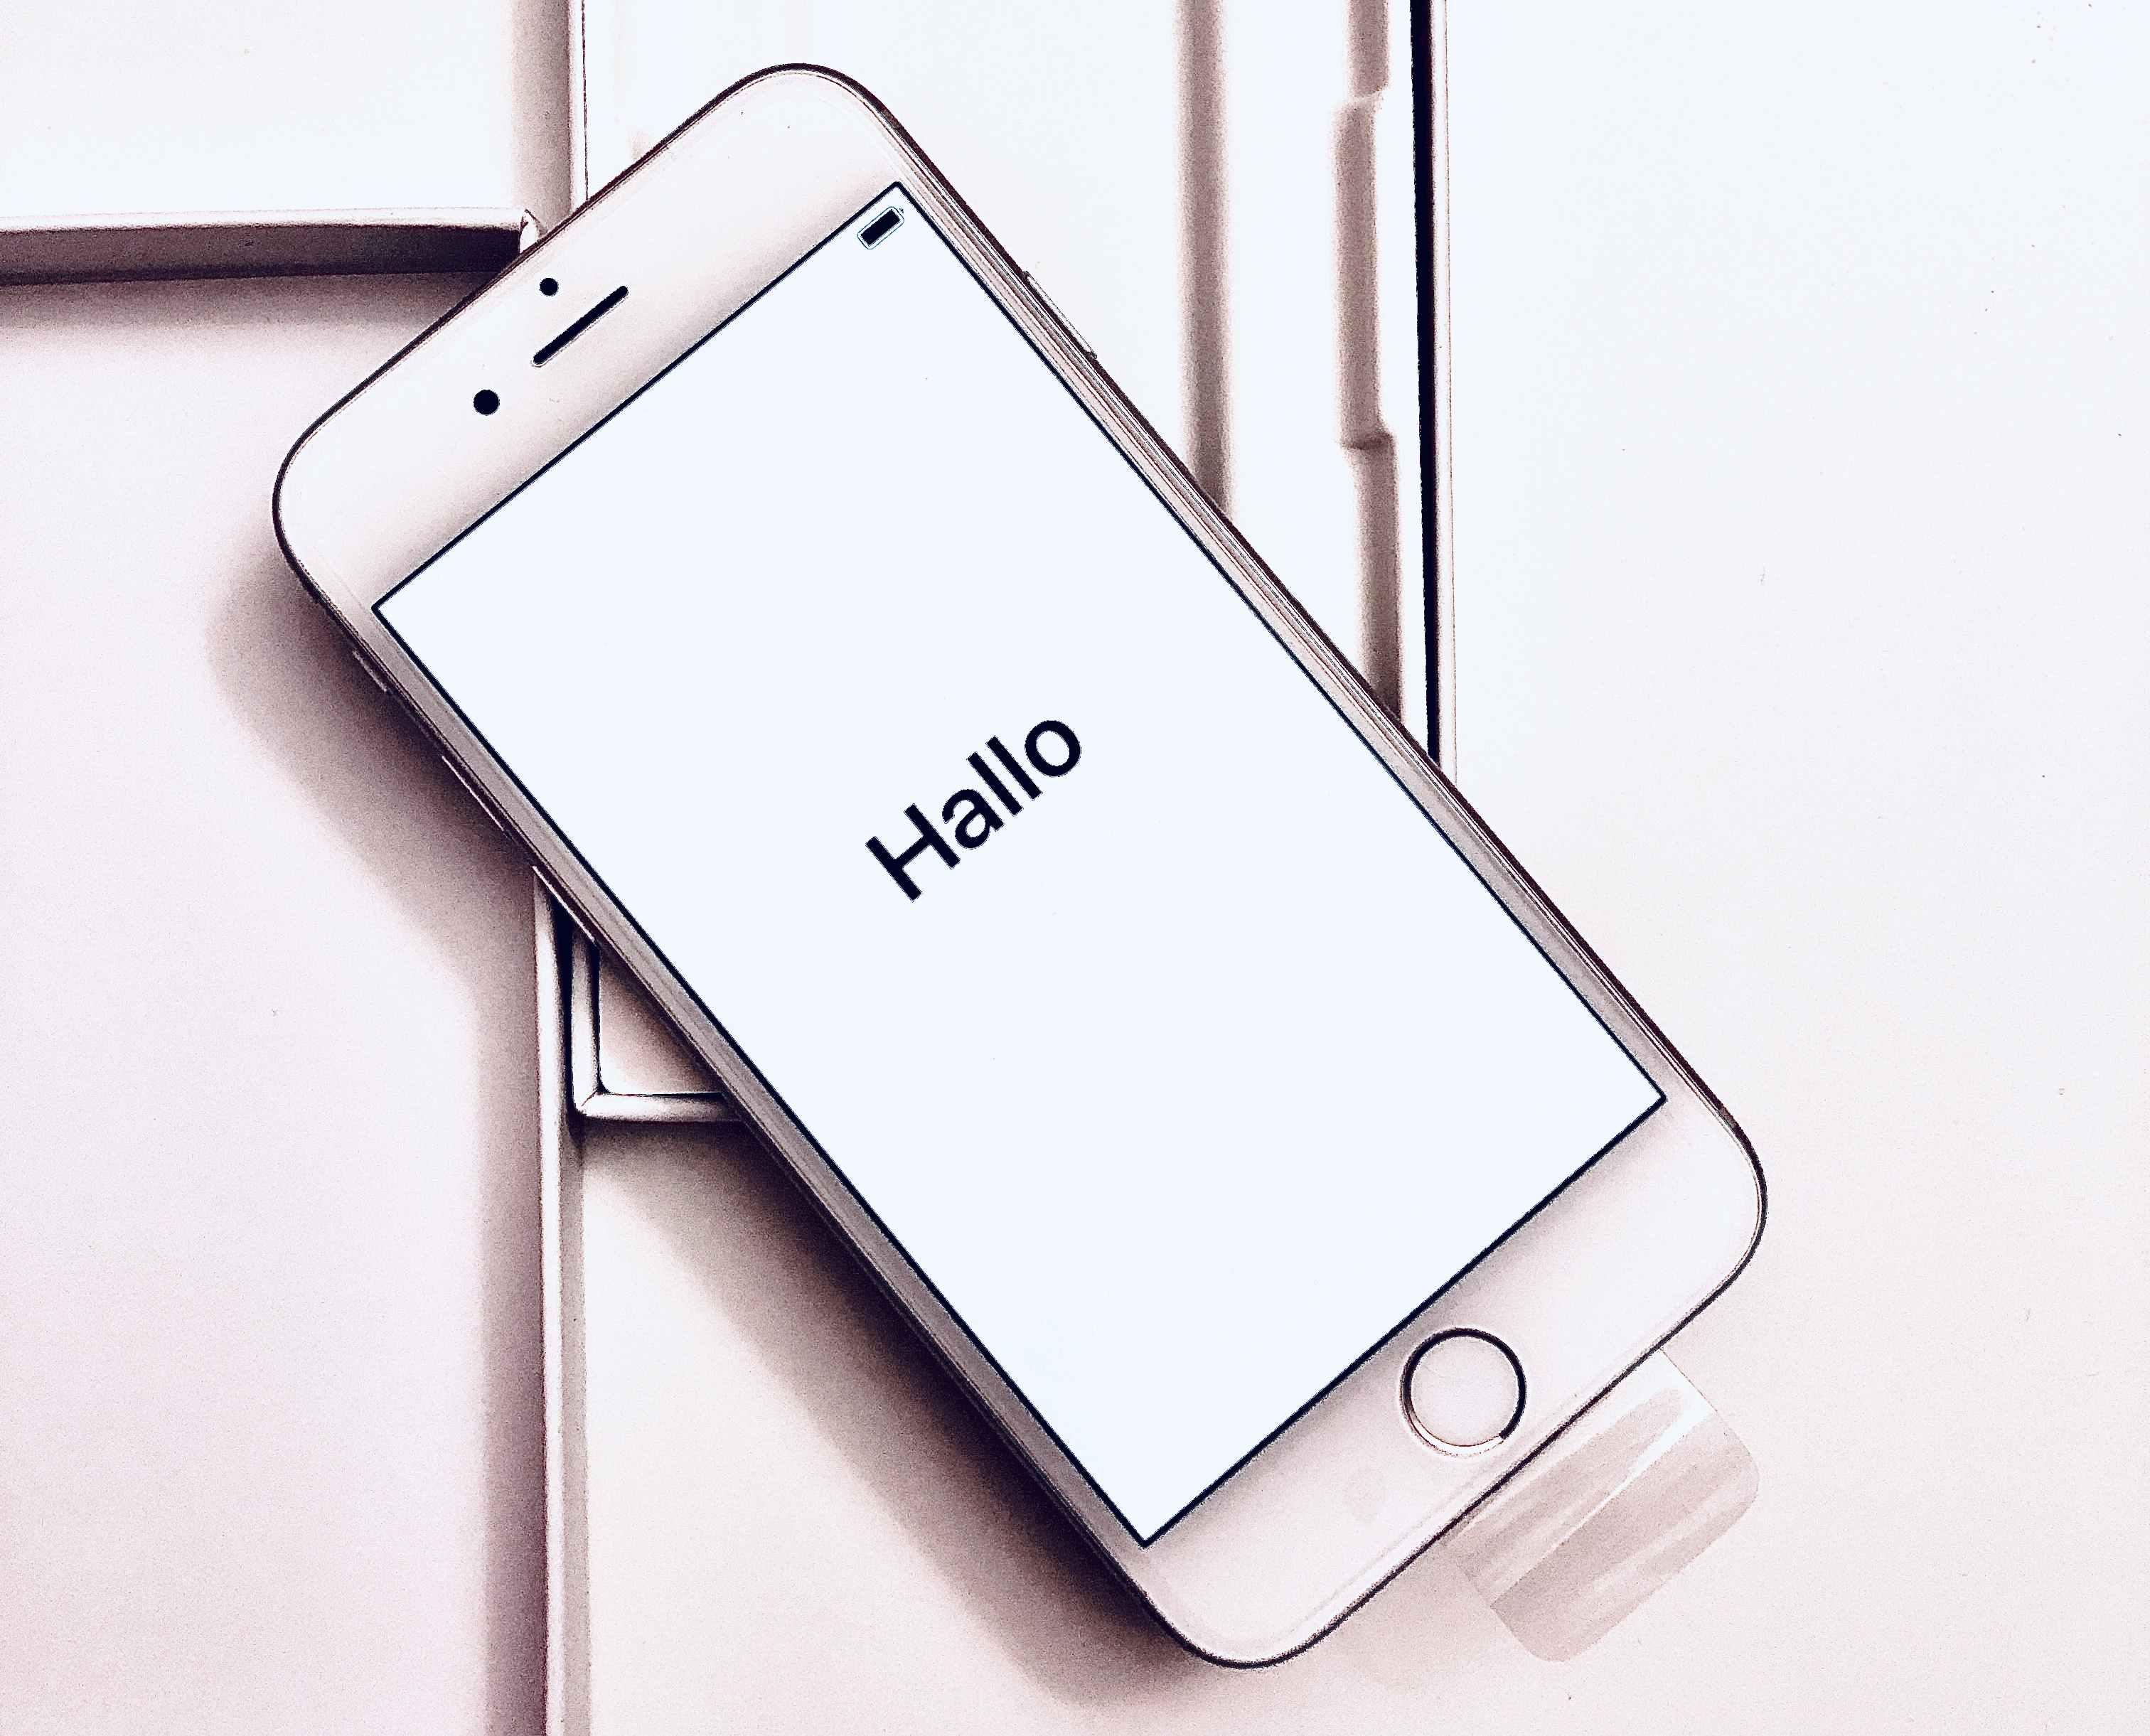 iphone 6 akku tauschen bei apple